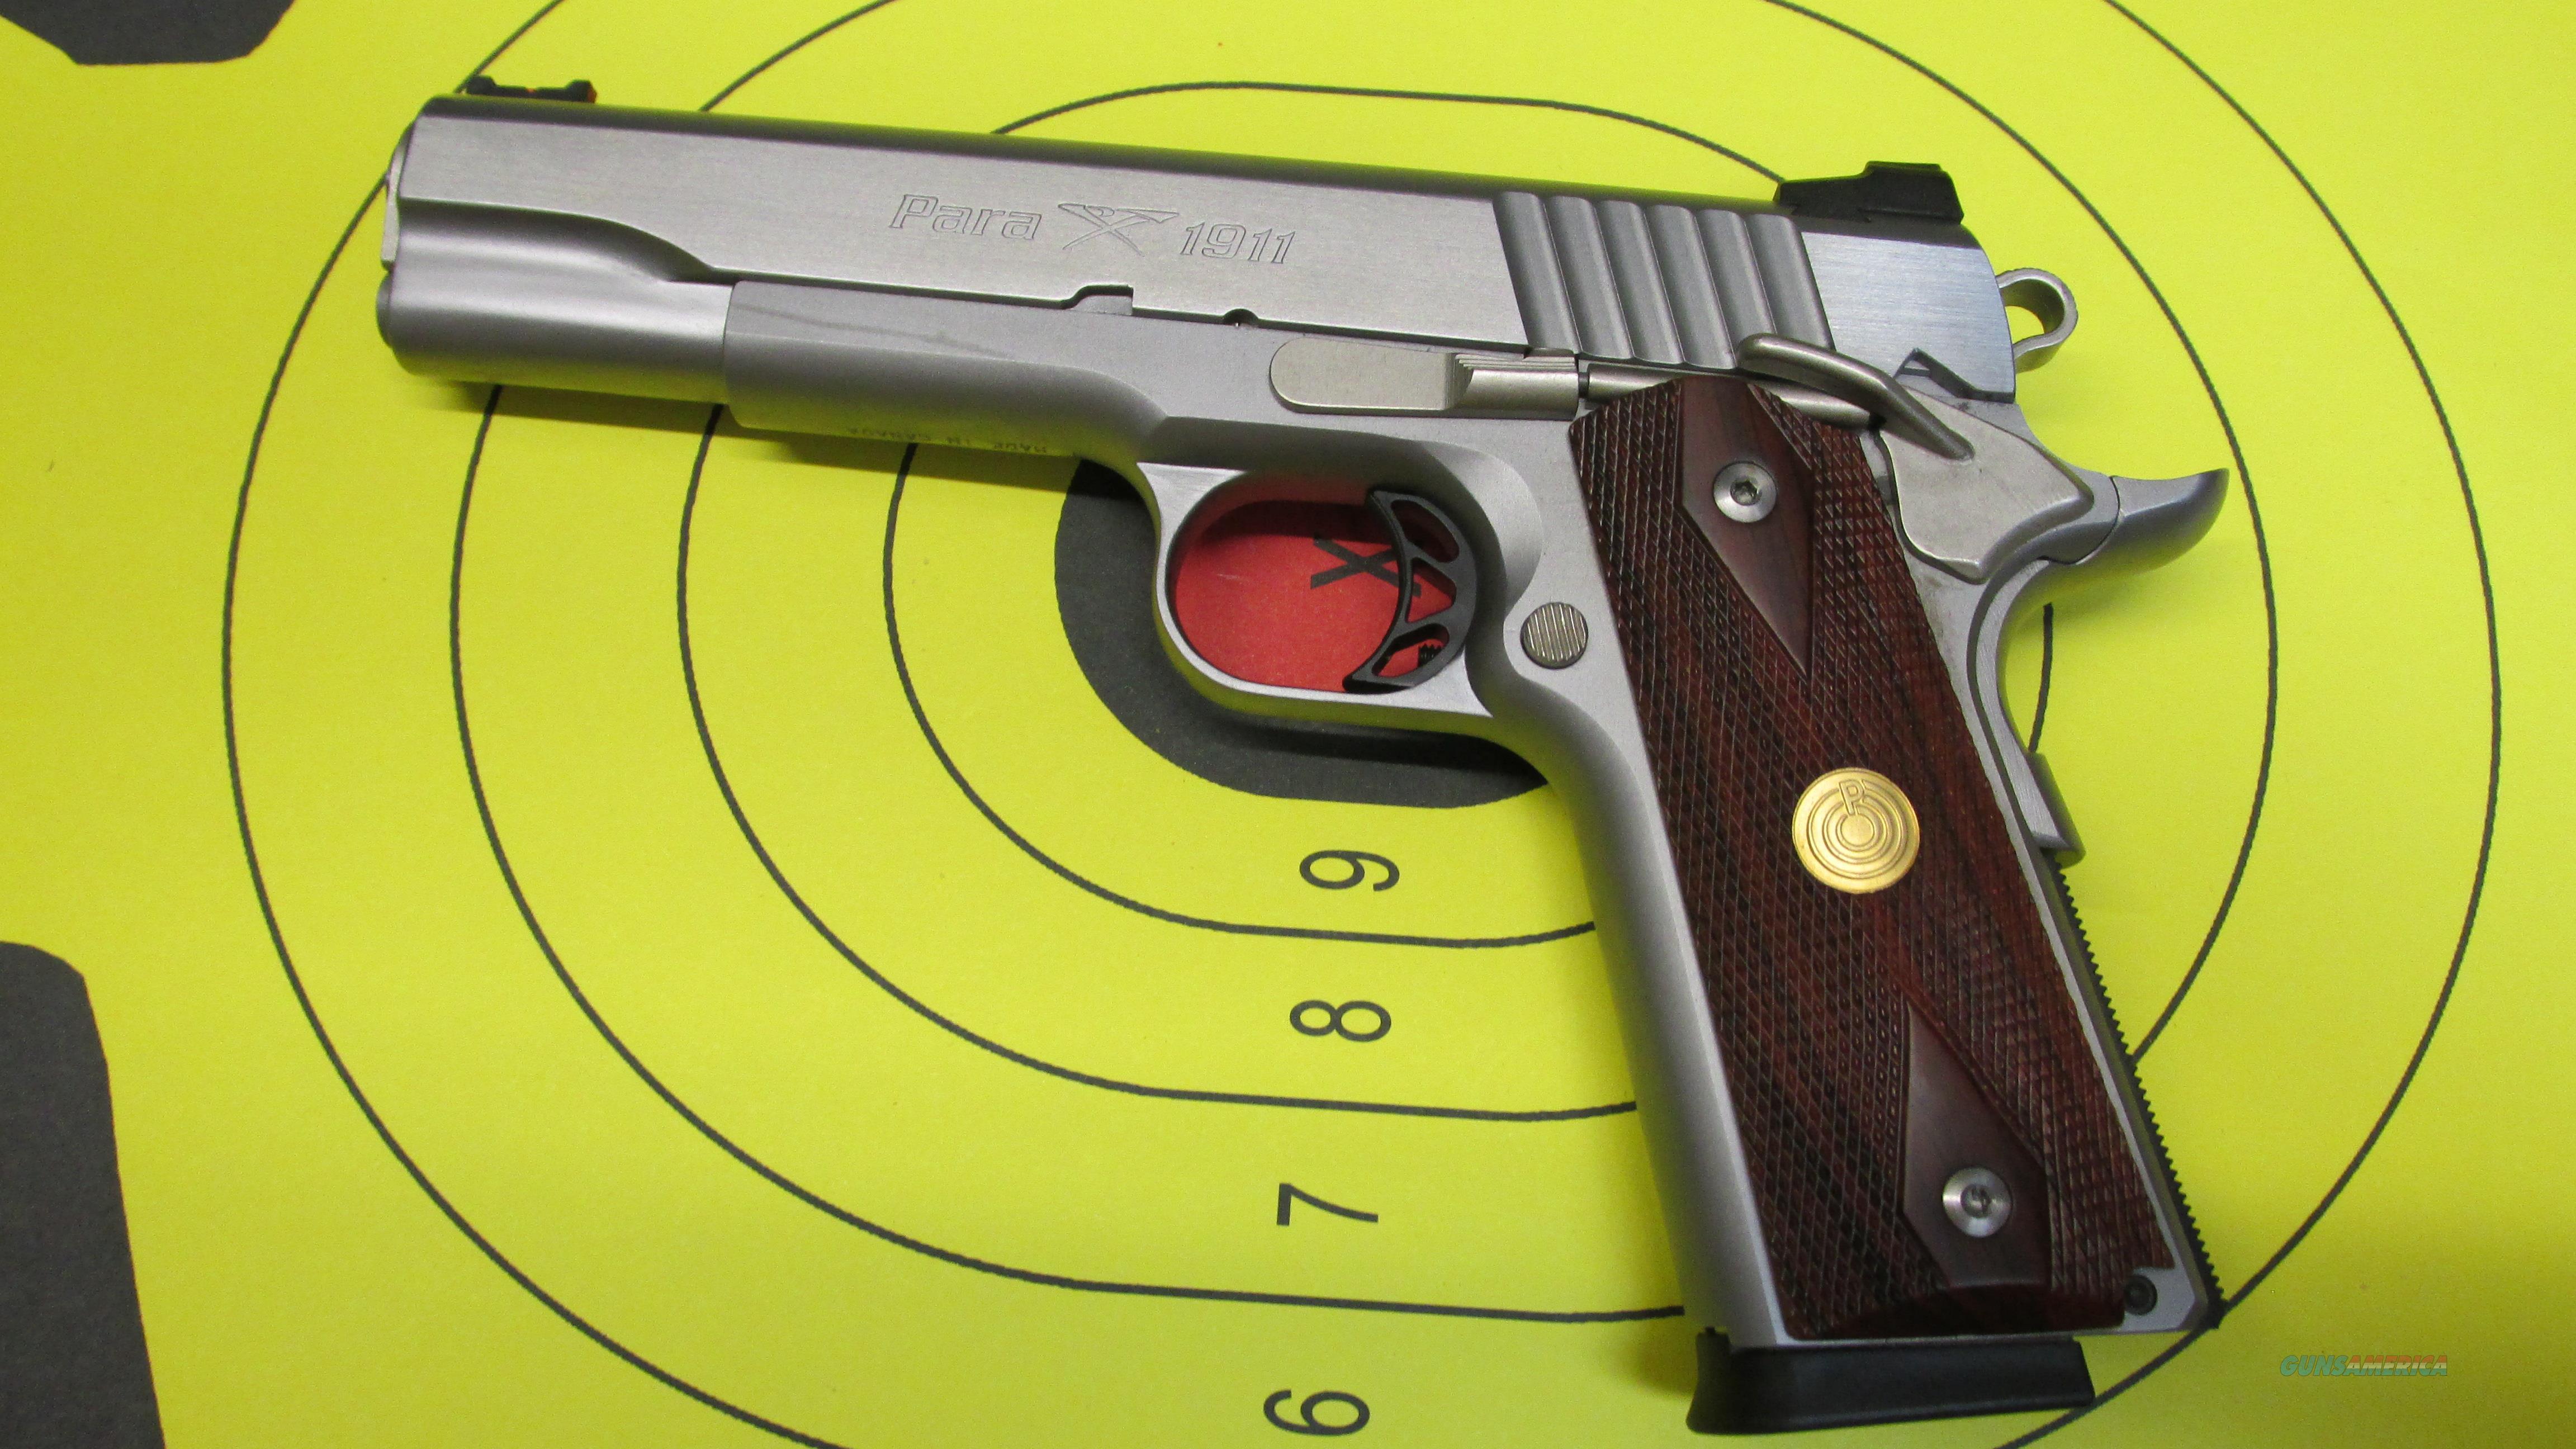 "PARA ORDNANCE 1911 STAINLESS .45 ACP PISTOL 8 ROUND MAGAZINE 5"" BARREL  Guns > Pistols > Para Ordnance Pistols"